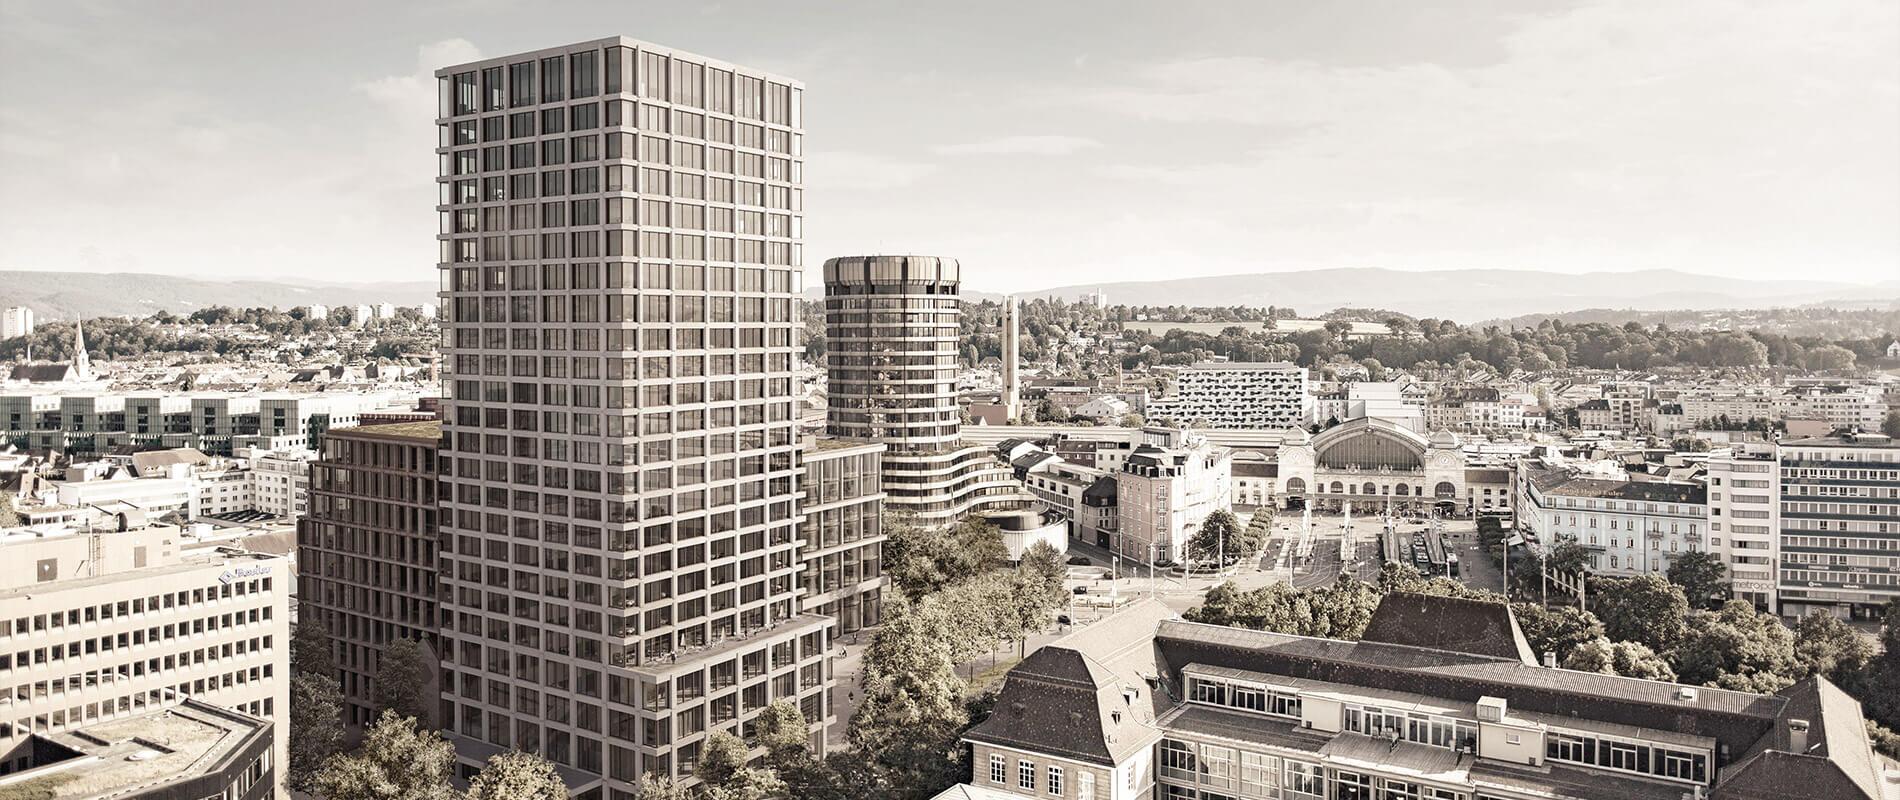 Baloise Park |Turm von Miller & Maranta und Matteo Thun |Referenz |Ettinger Partner